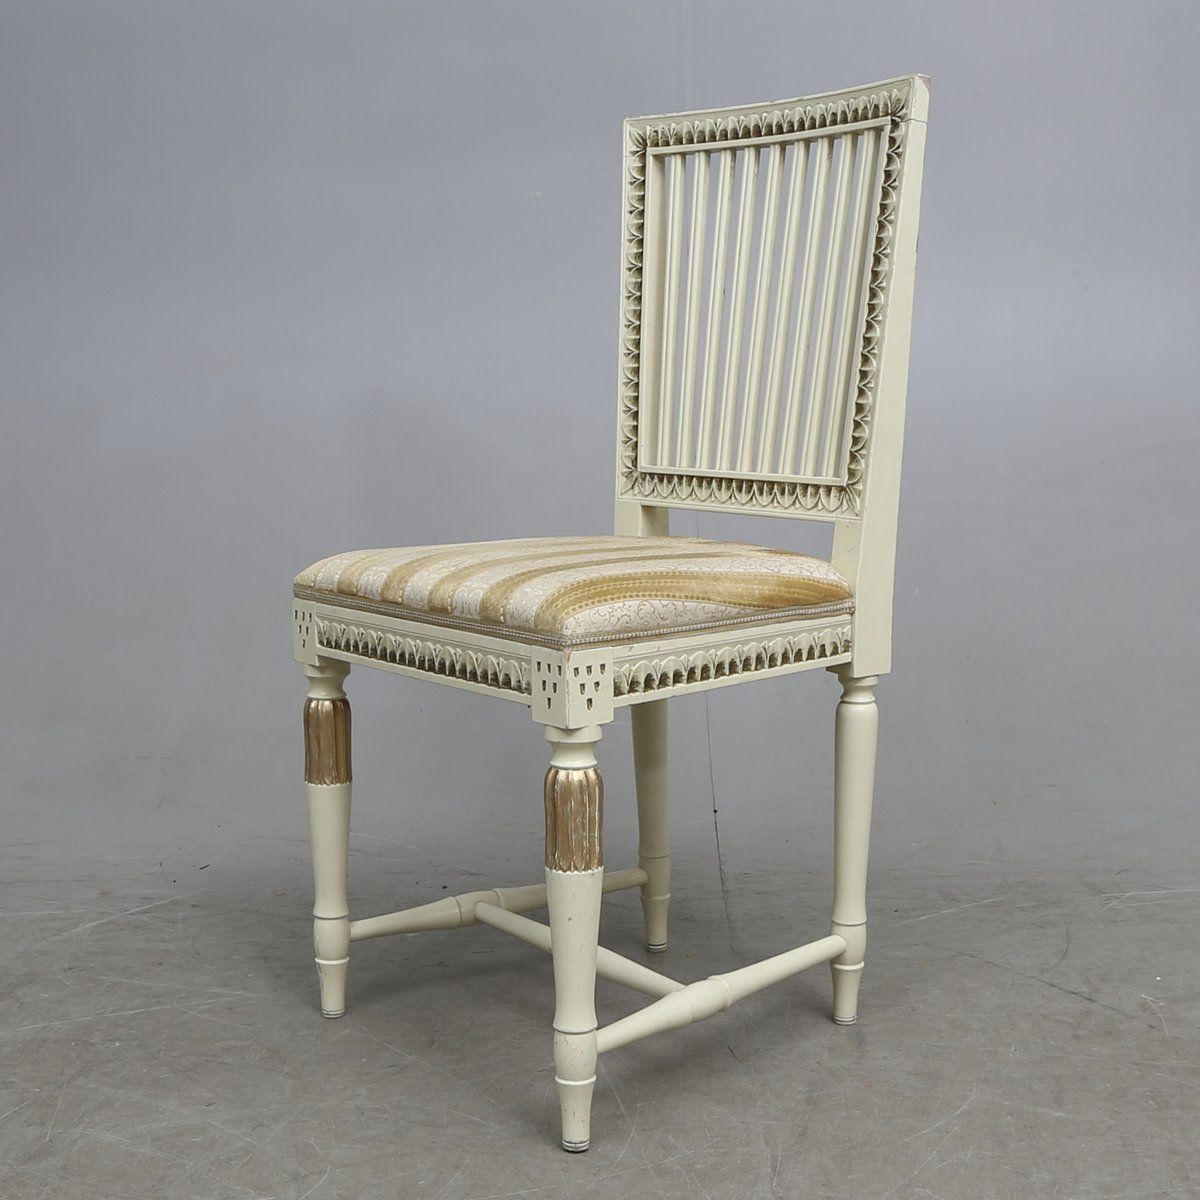 Antique Swedish Furniture For Sale Antique Furniture